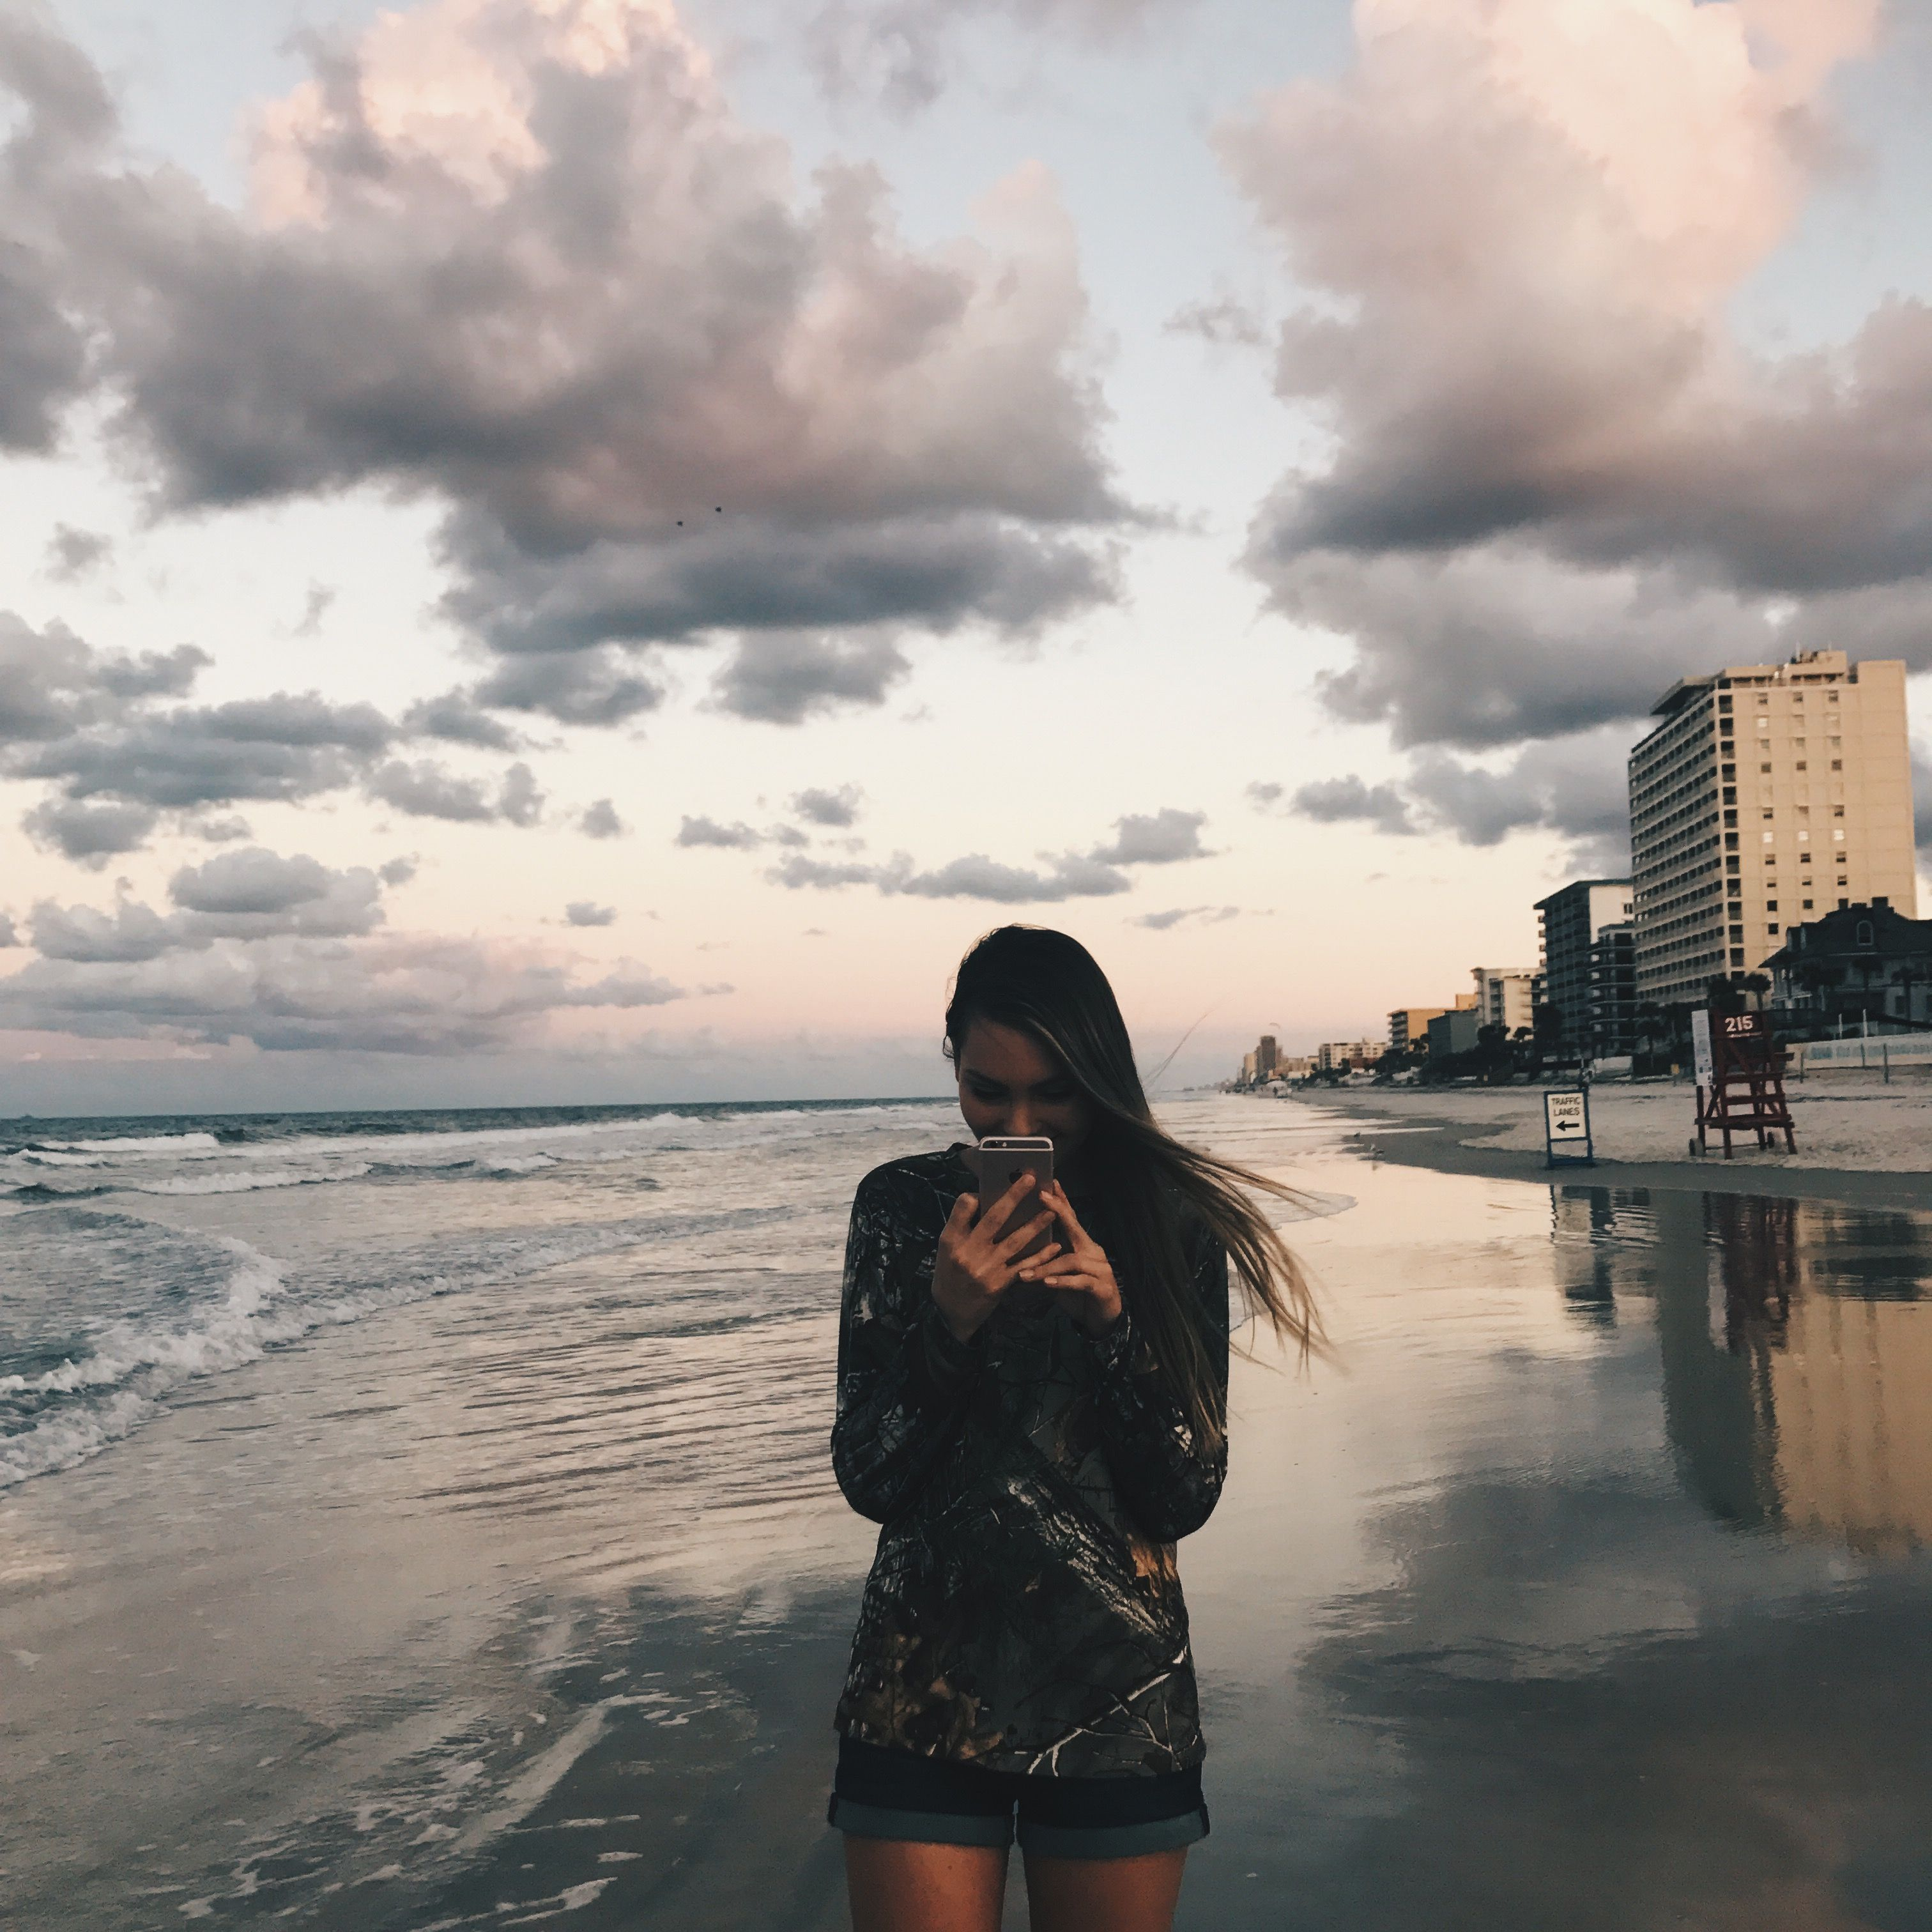 Instagram artsy photography iphone 7 vsco cam app for Tumblr photography summer beach